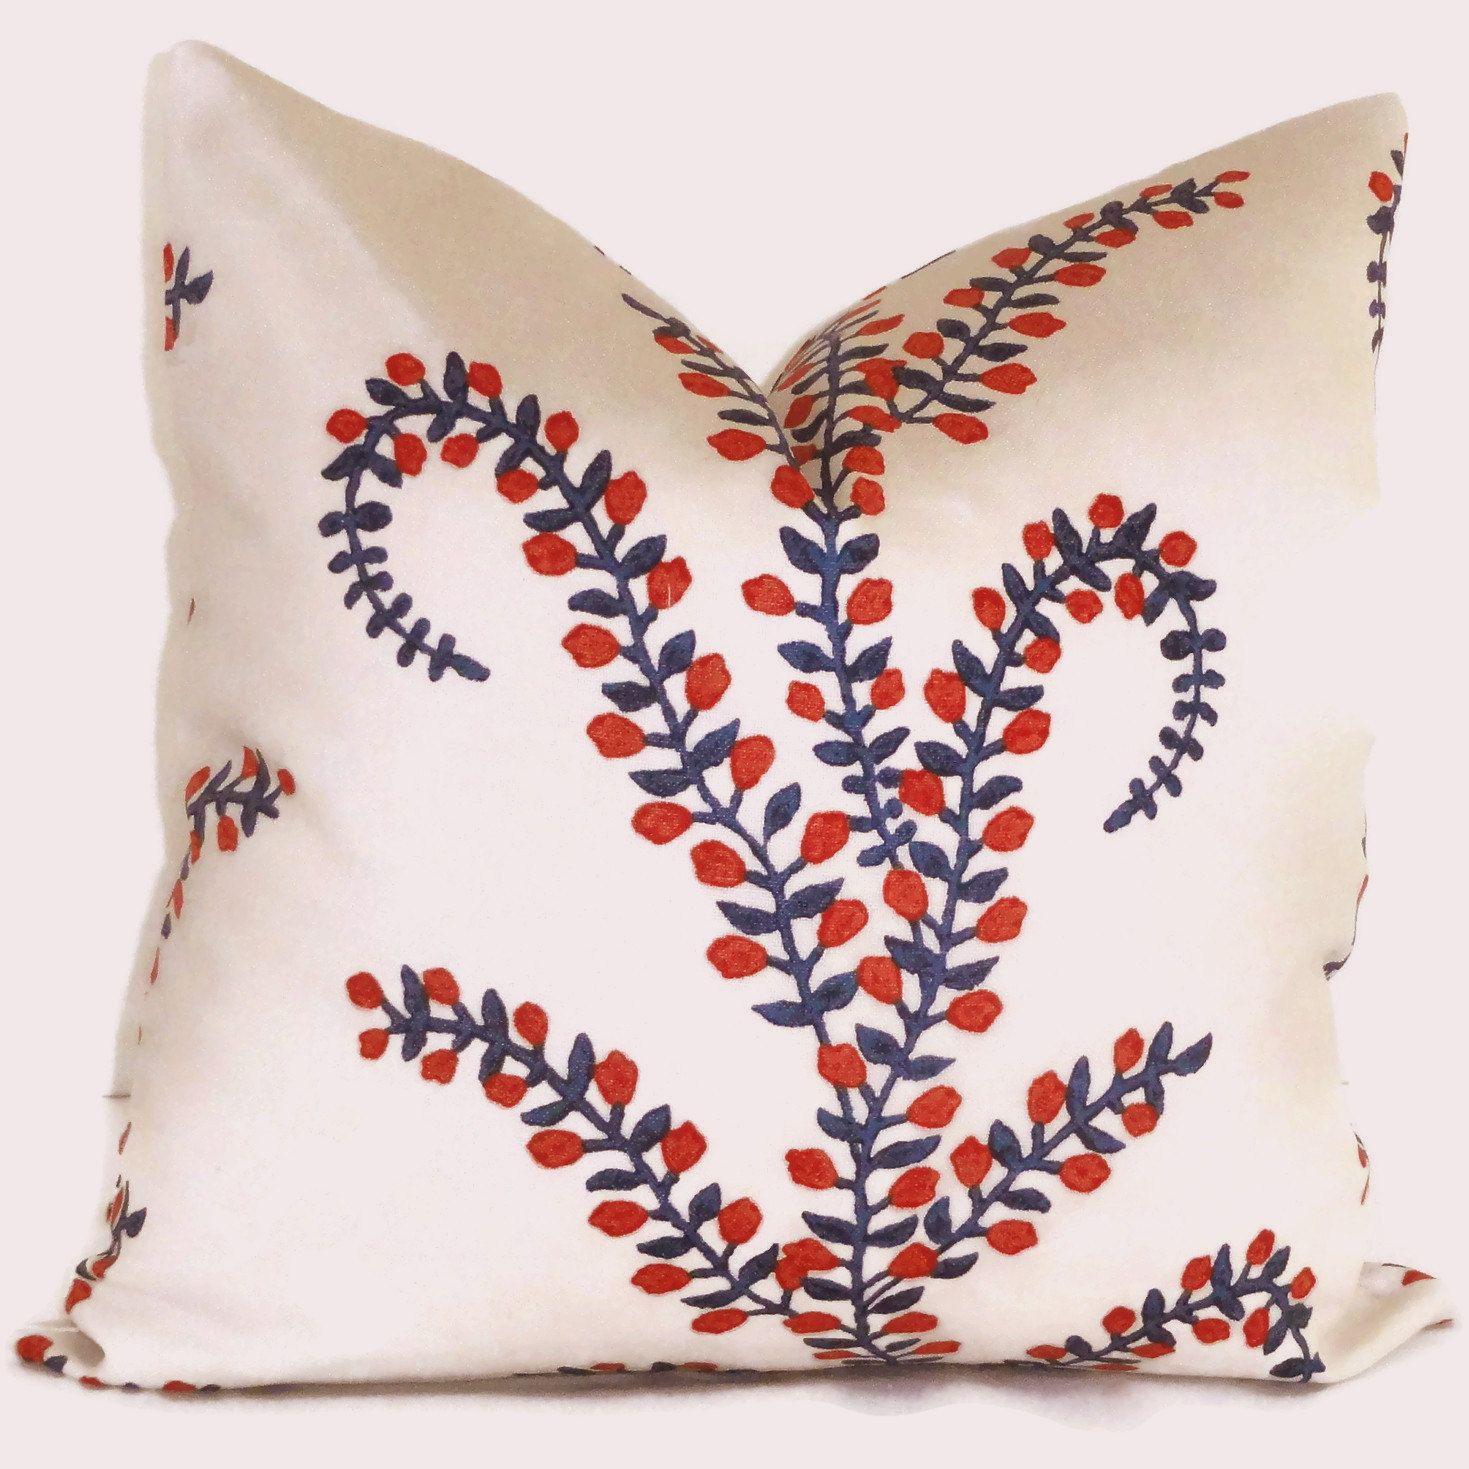 Red White Blue Prasana Decorative Pillow Cover Square or Euro